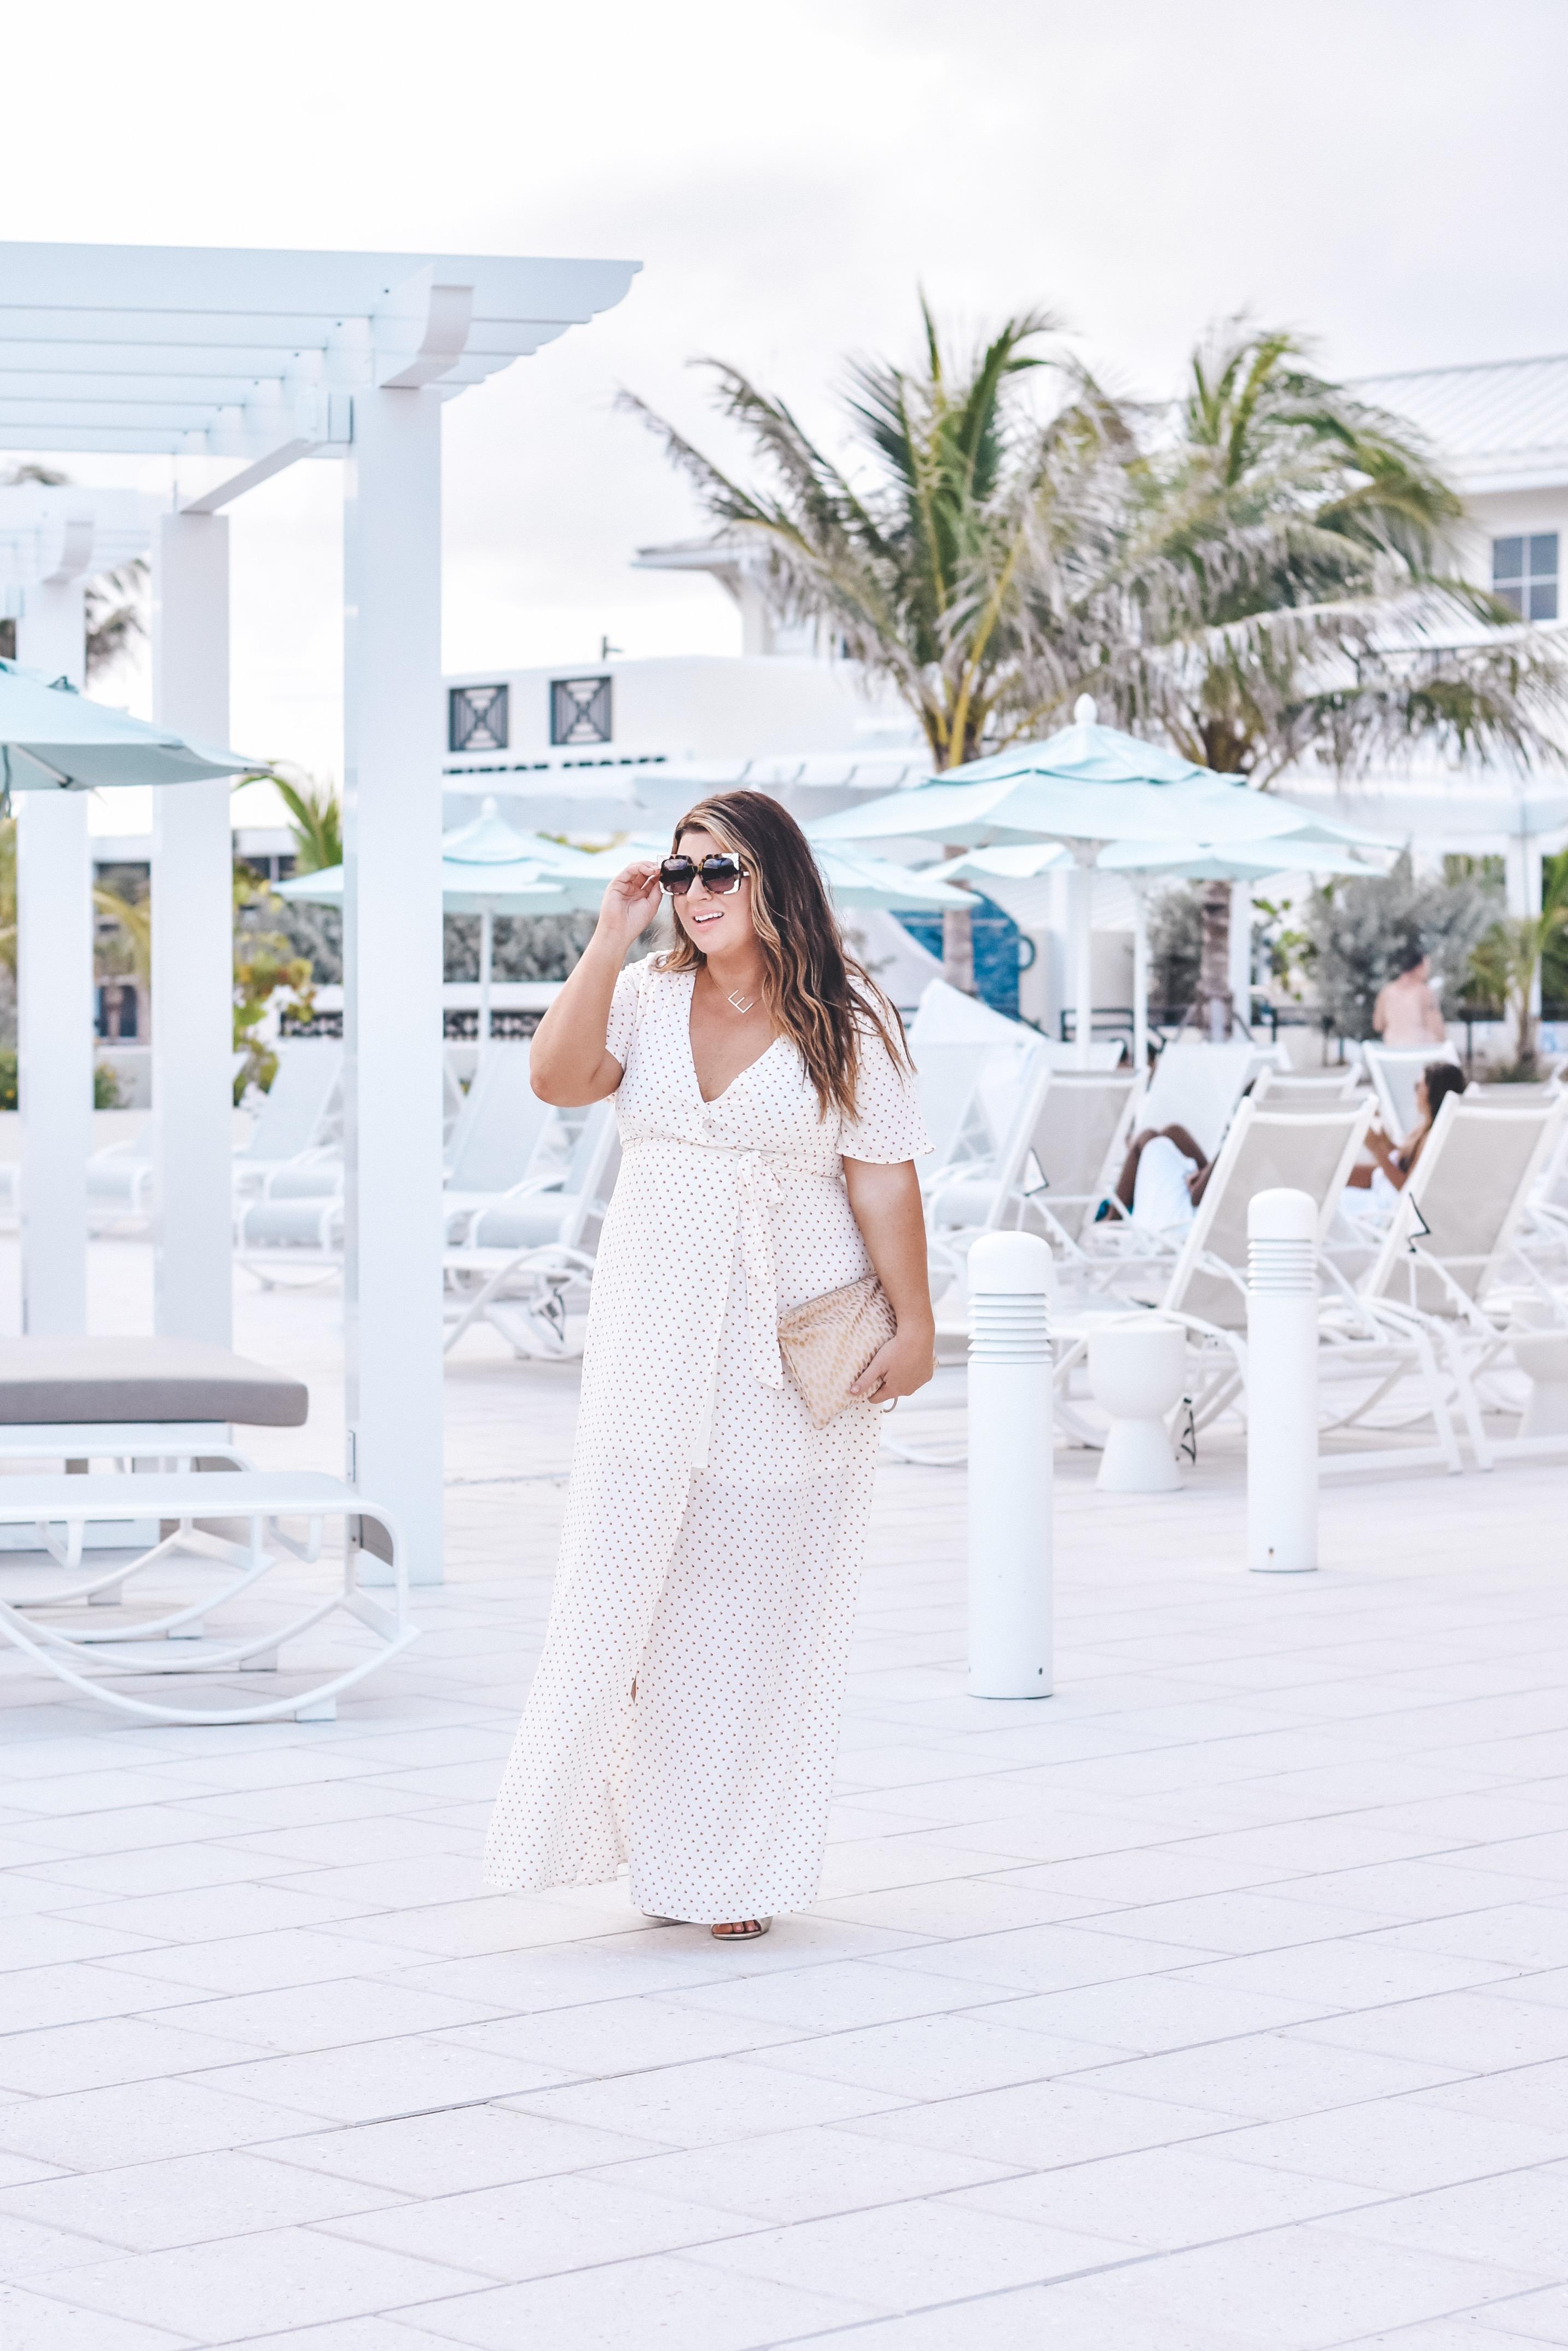 Hutchinson Shores - 30A Mama Travel - Resort Style - Beach Maxi Dress - Erika Powell Clutch